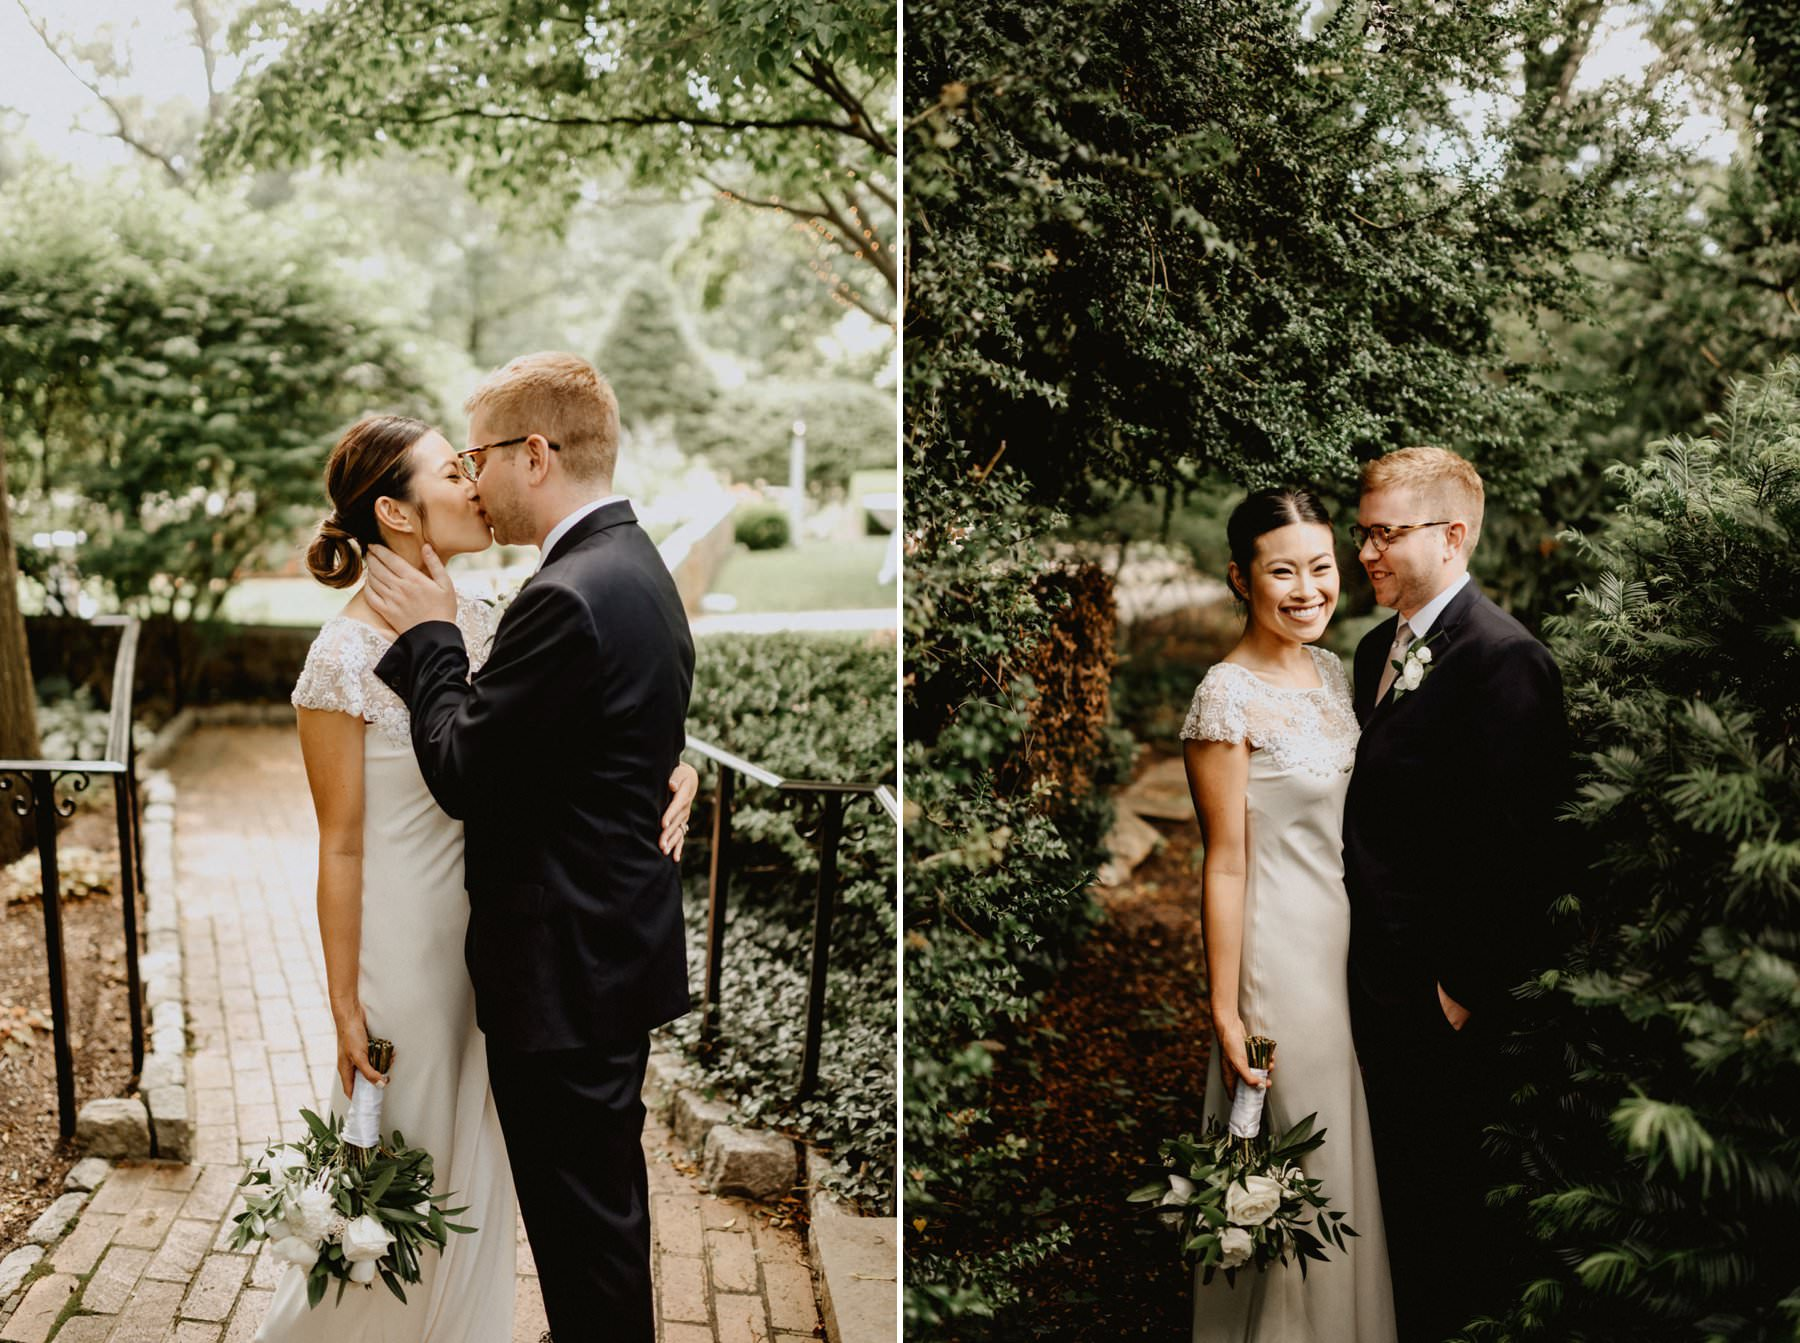 Appleford-estate-wedding-44.jpg